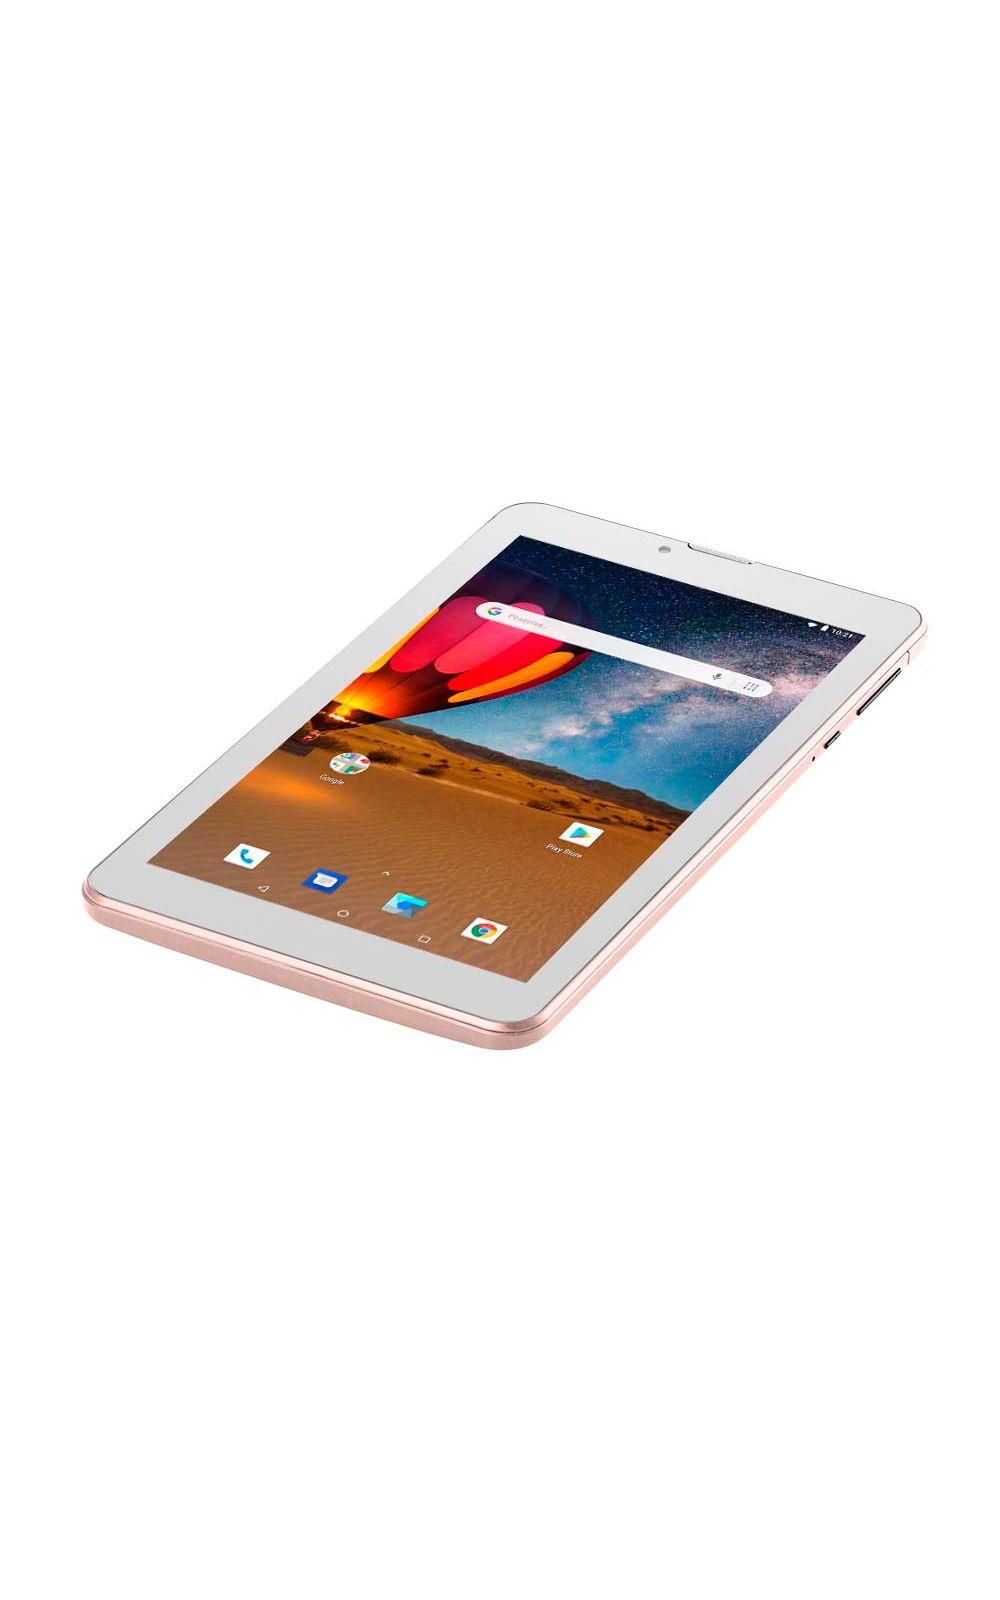 Foto 6 - Tablet Multilaser M7 3G Plus Dual Chip Quad Core 1 GB de Ram Memória 16 GB Tela 7 Polegadas Rosa - NB305